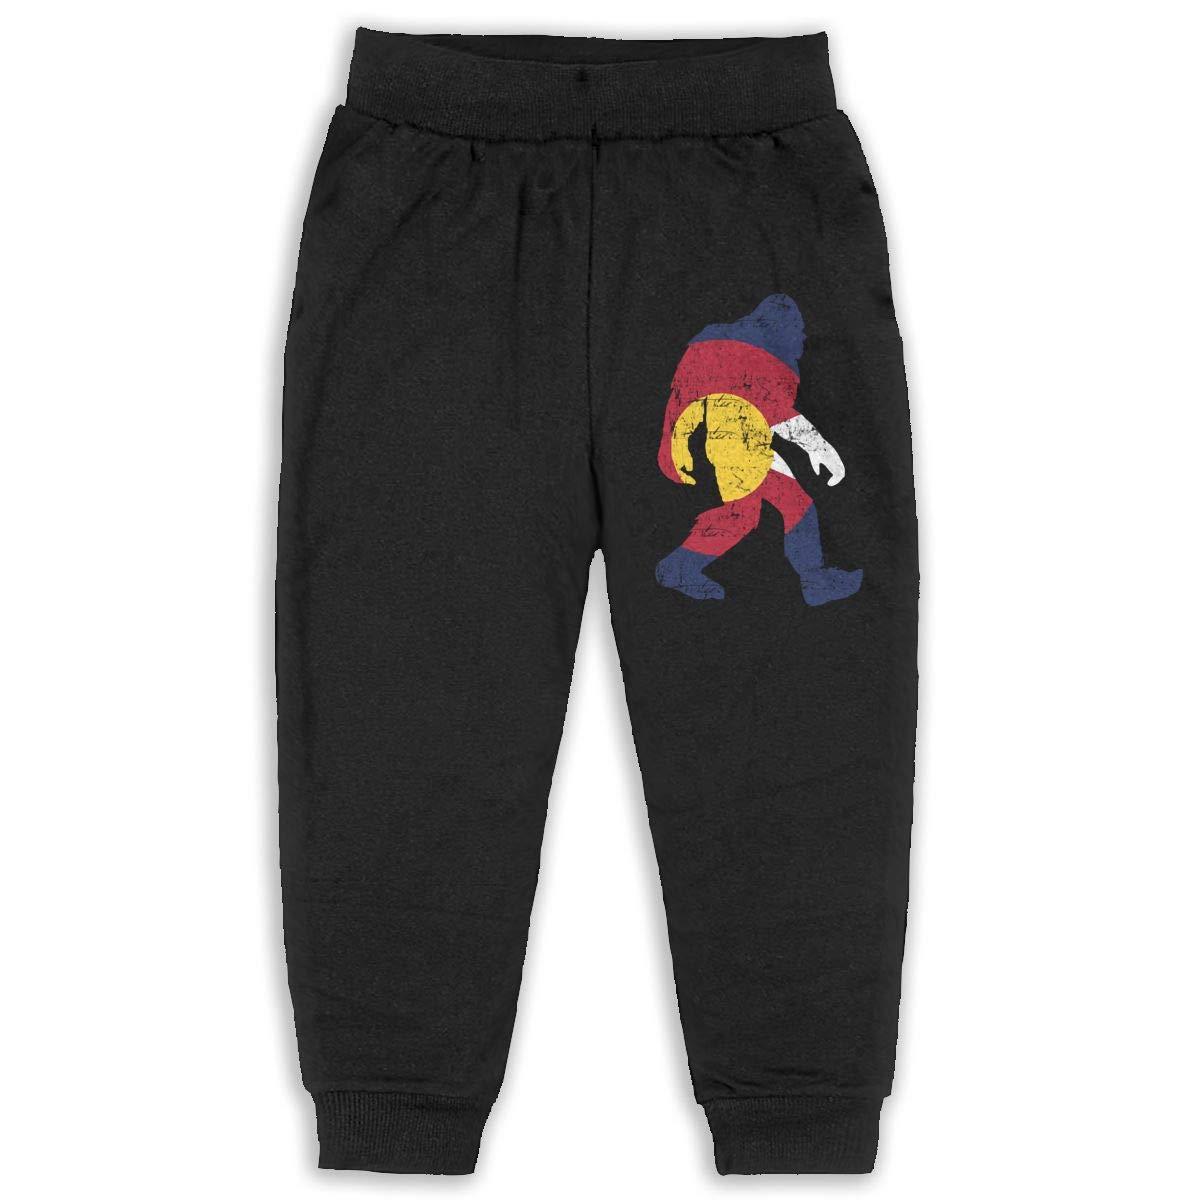 JOAPNWJ Children Cartoon Cotton Sweatpants Sport Jogger Elastic Pants